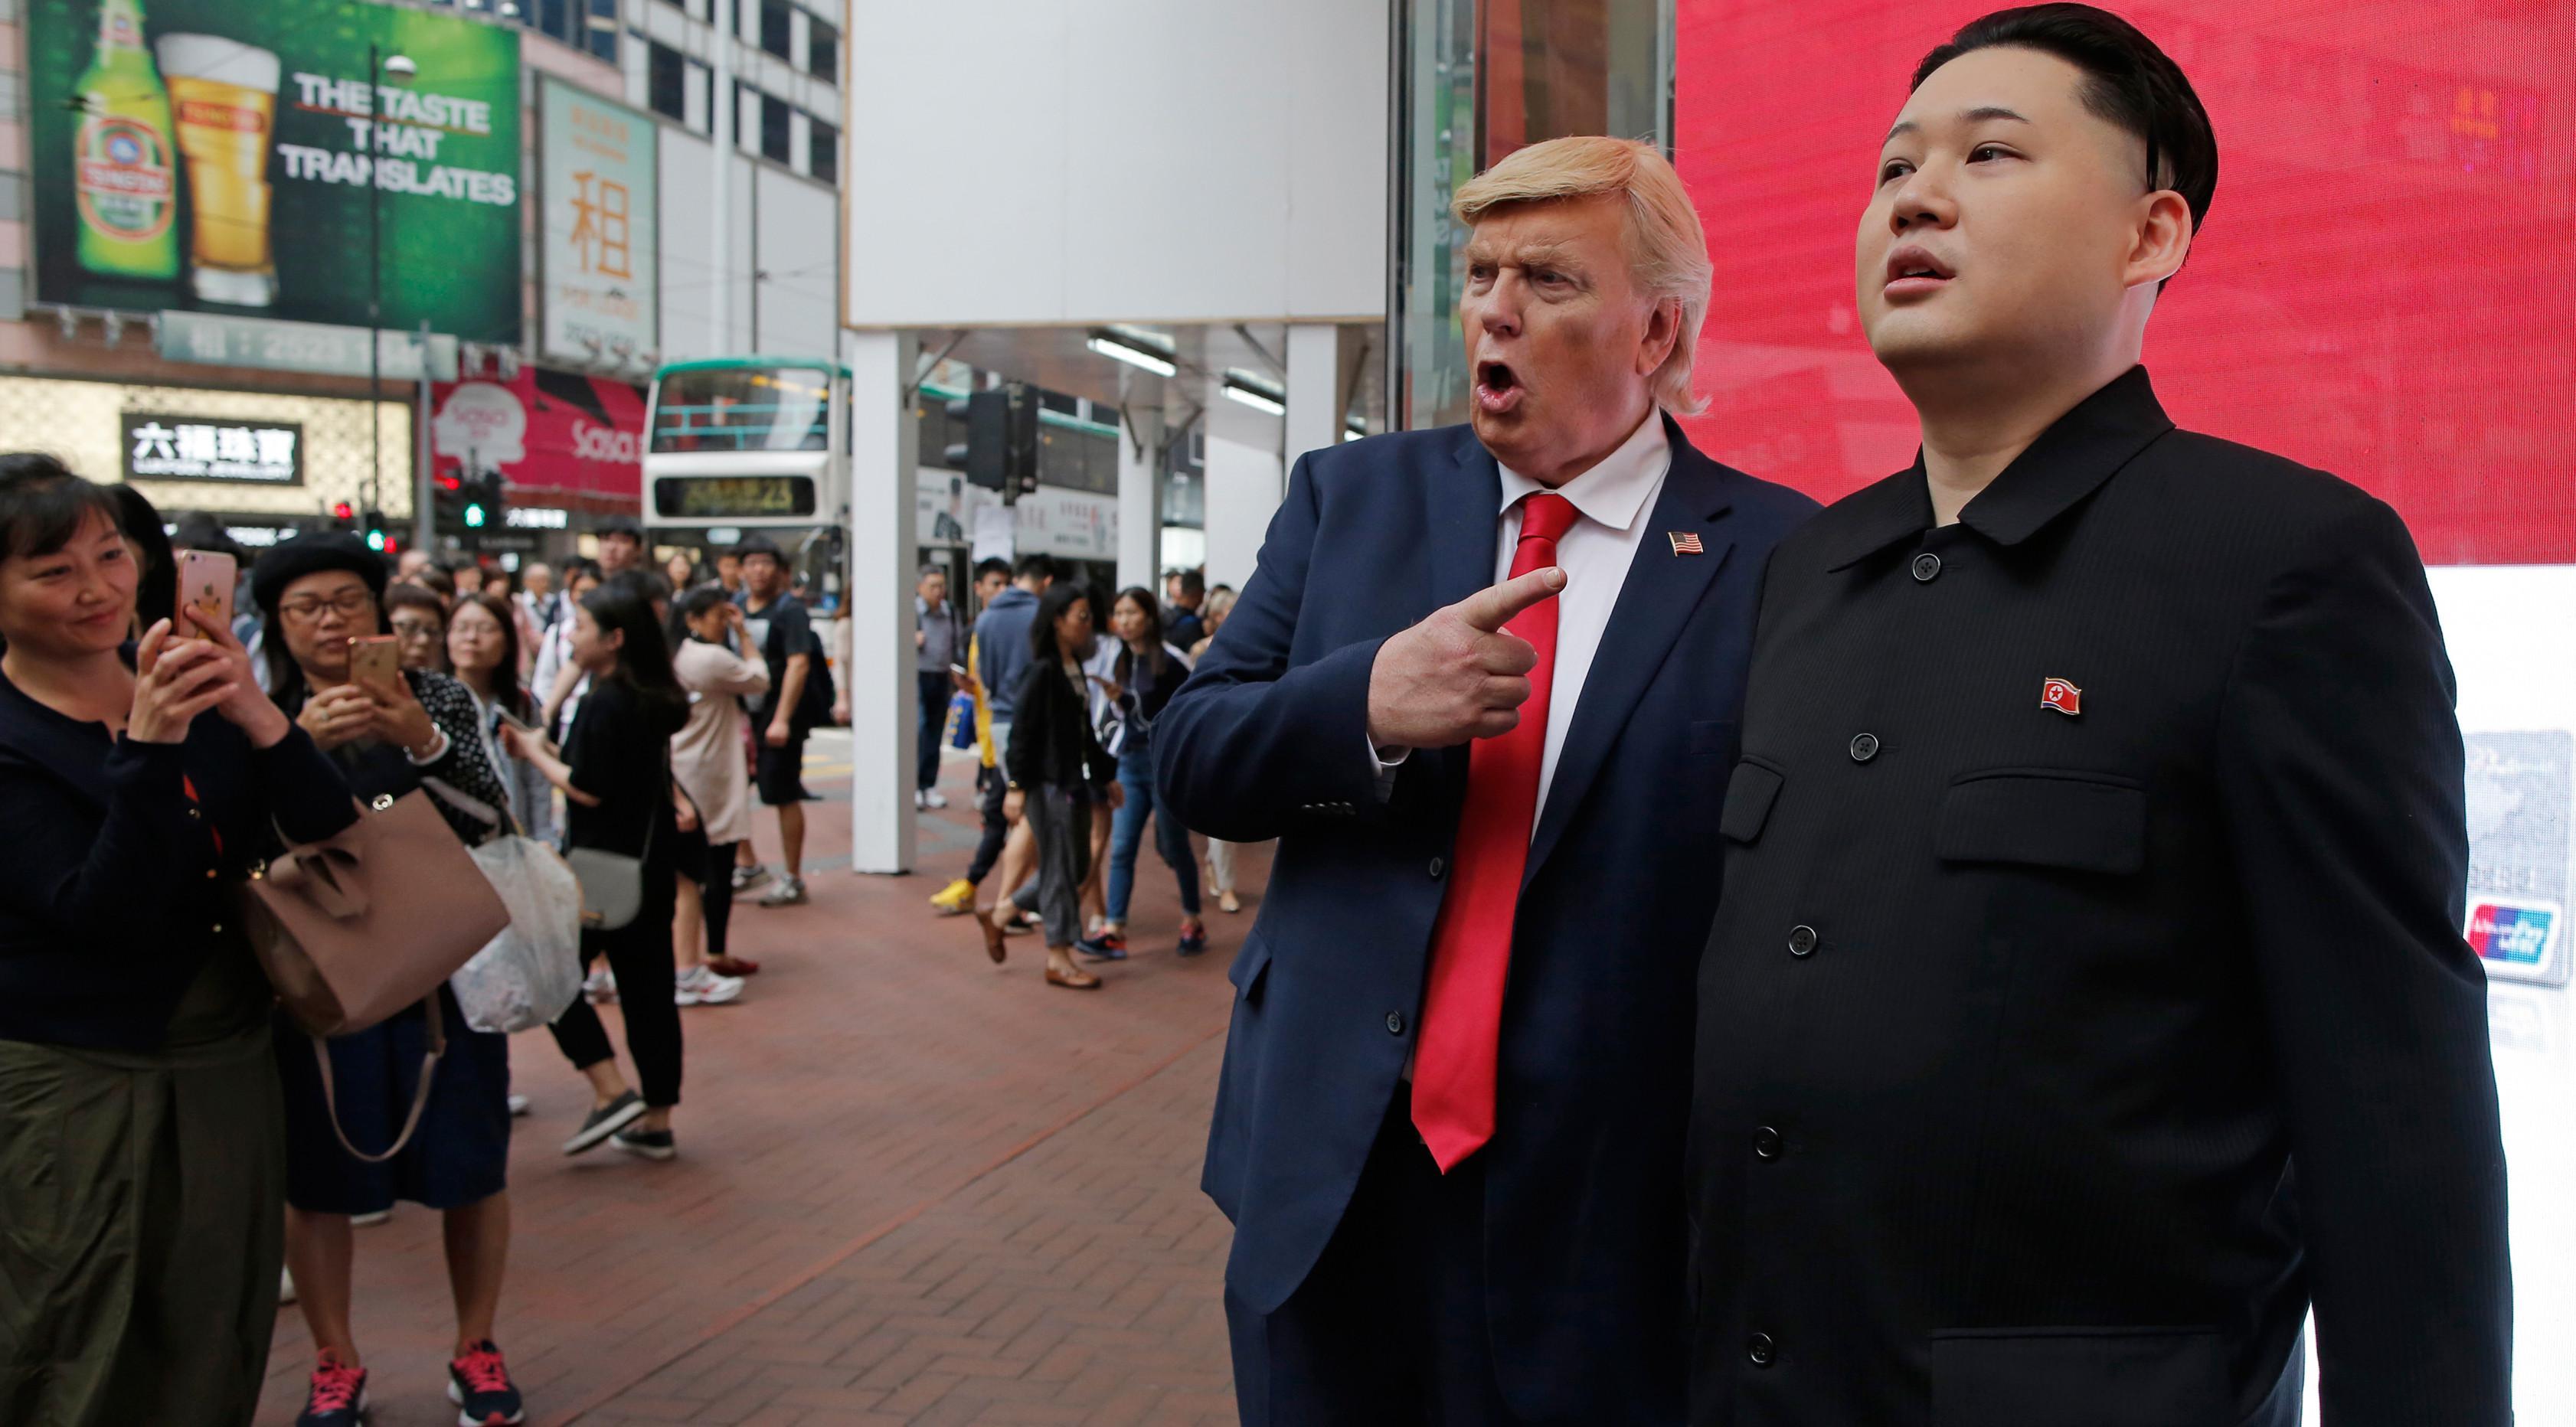 Pengunjung mengambil gambar Reggie Brown yang berdandan mirip Pemimpin Korea Utara, Kim Jong-un dan Dennis Alan yang berdandan mirip Presiden AS Donald Trump saat mempromosikan Rugby Sevens di pusat kota Hong Kong, 7 April 2017. (AP Photo/Kin Cheung)